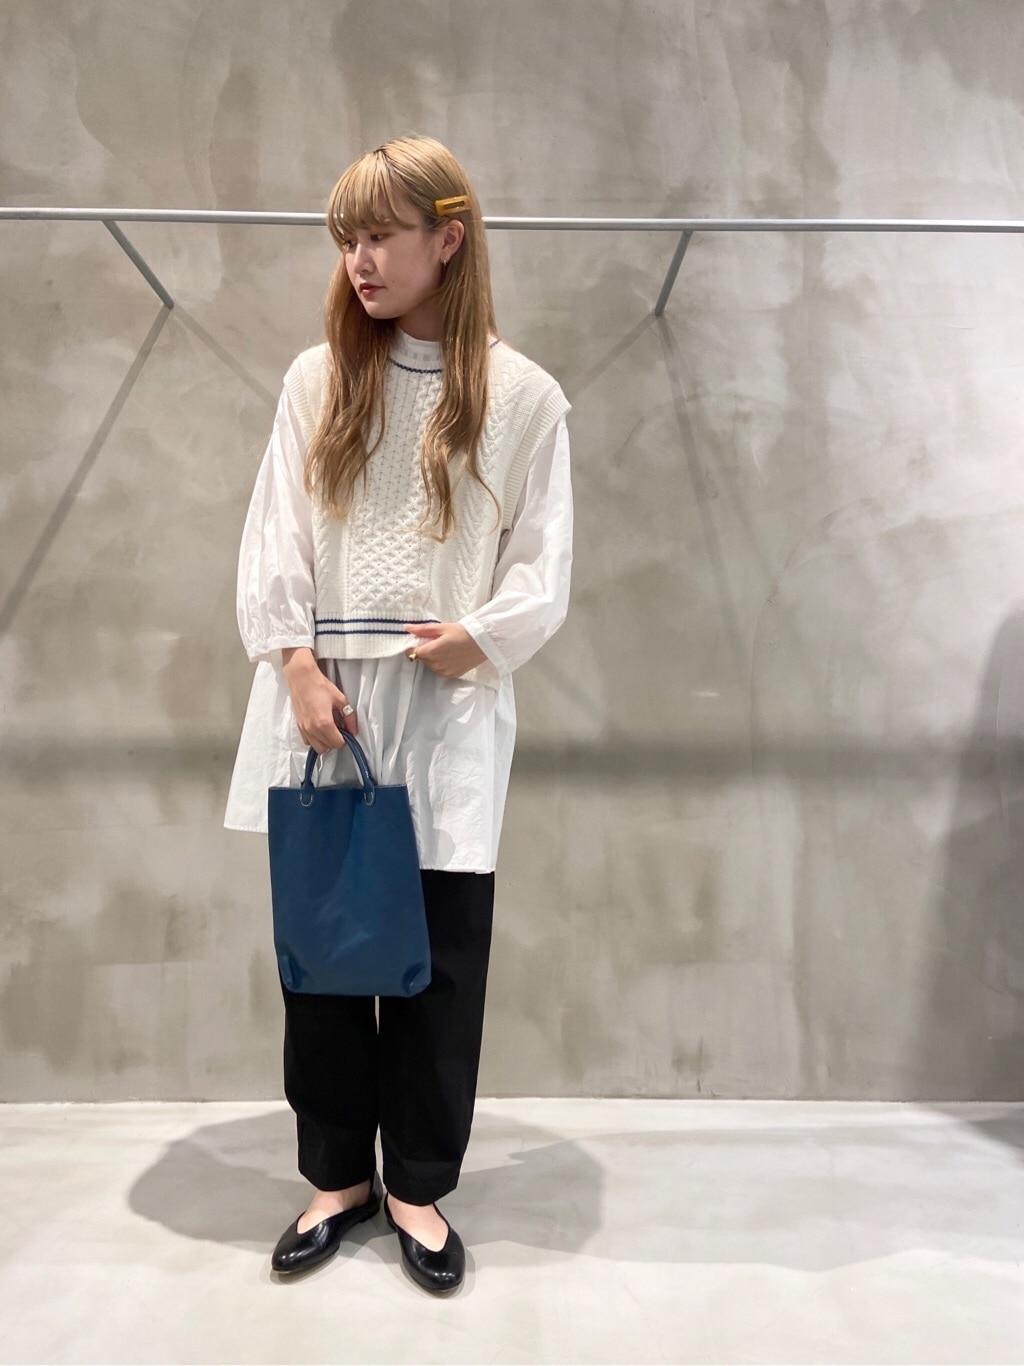 bulle de savon 渋谷スクランブルスクエア 身長:160cm 2020.09.14